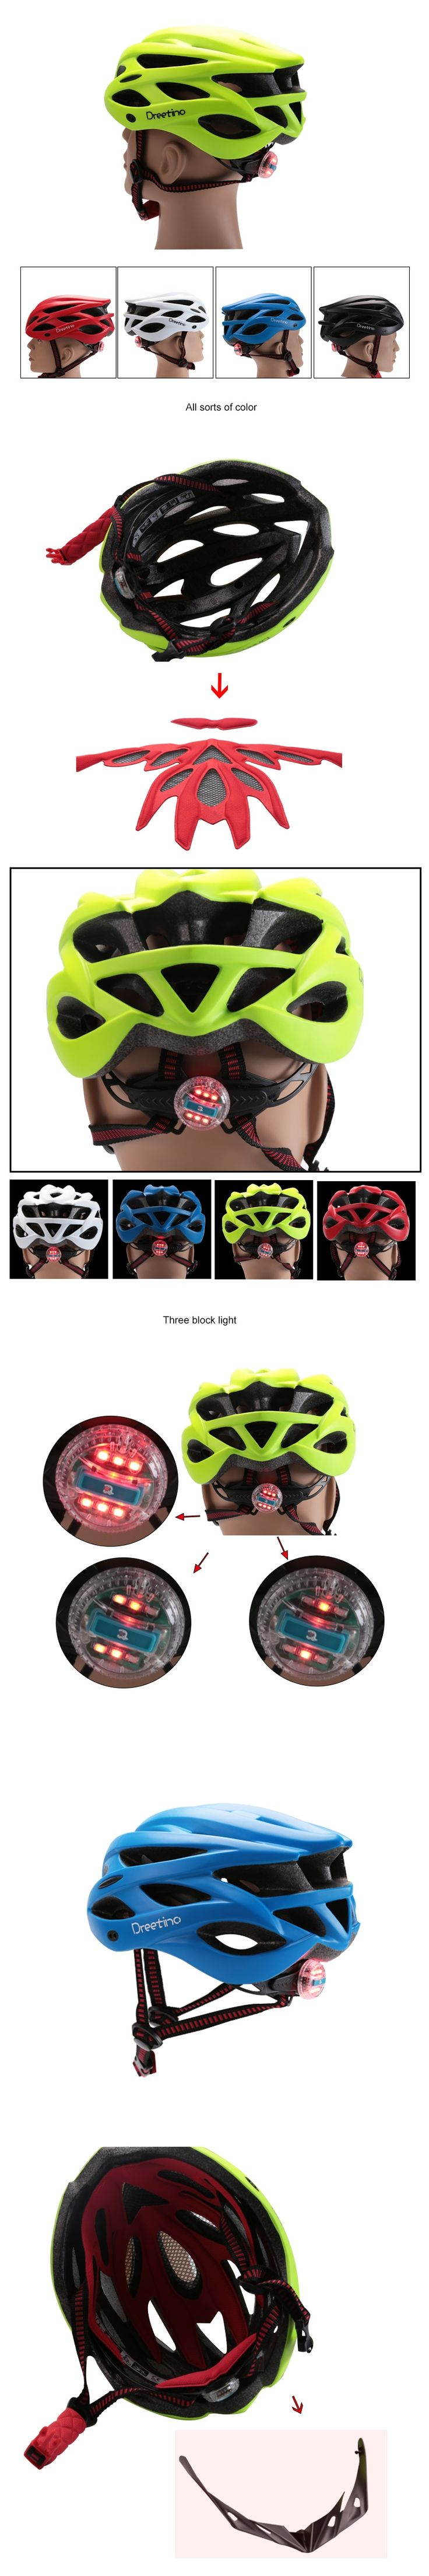 2017 Cycling Helmet with Light Bicycle Men Women Mountain Helmet Back Light Mountain Road Bike Integrally Molded Cycling Helmets